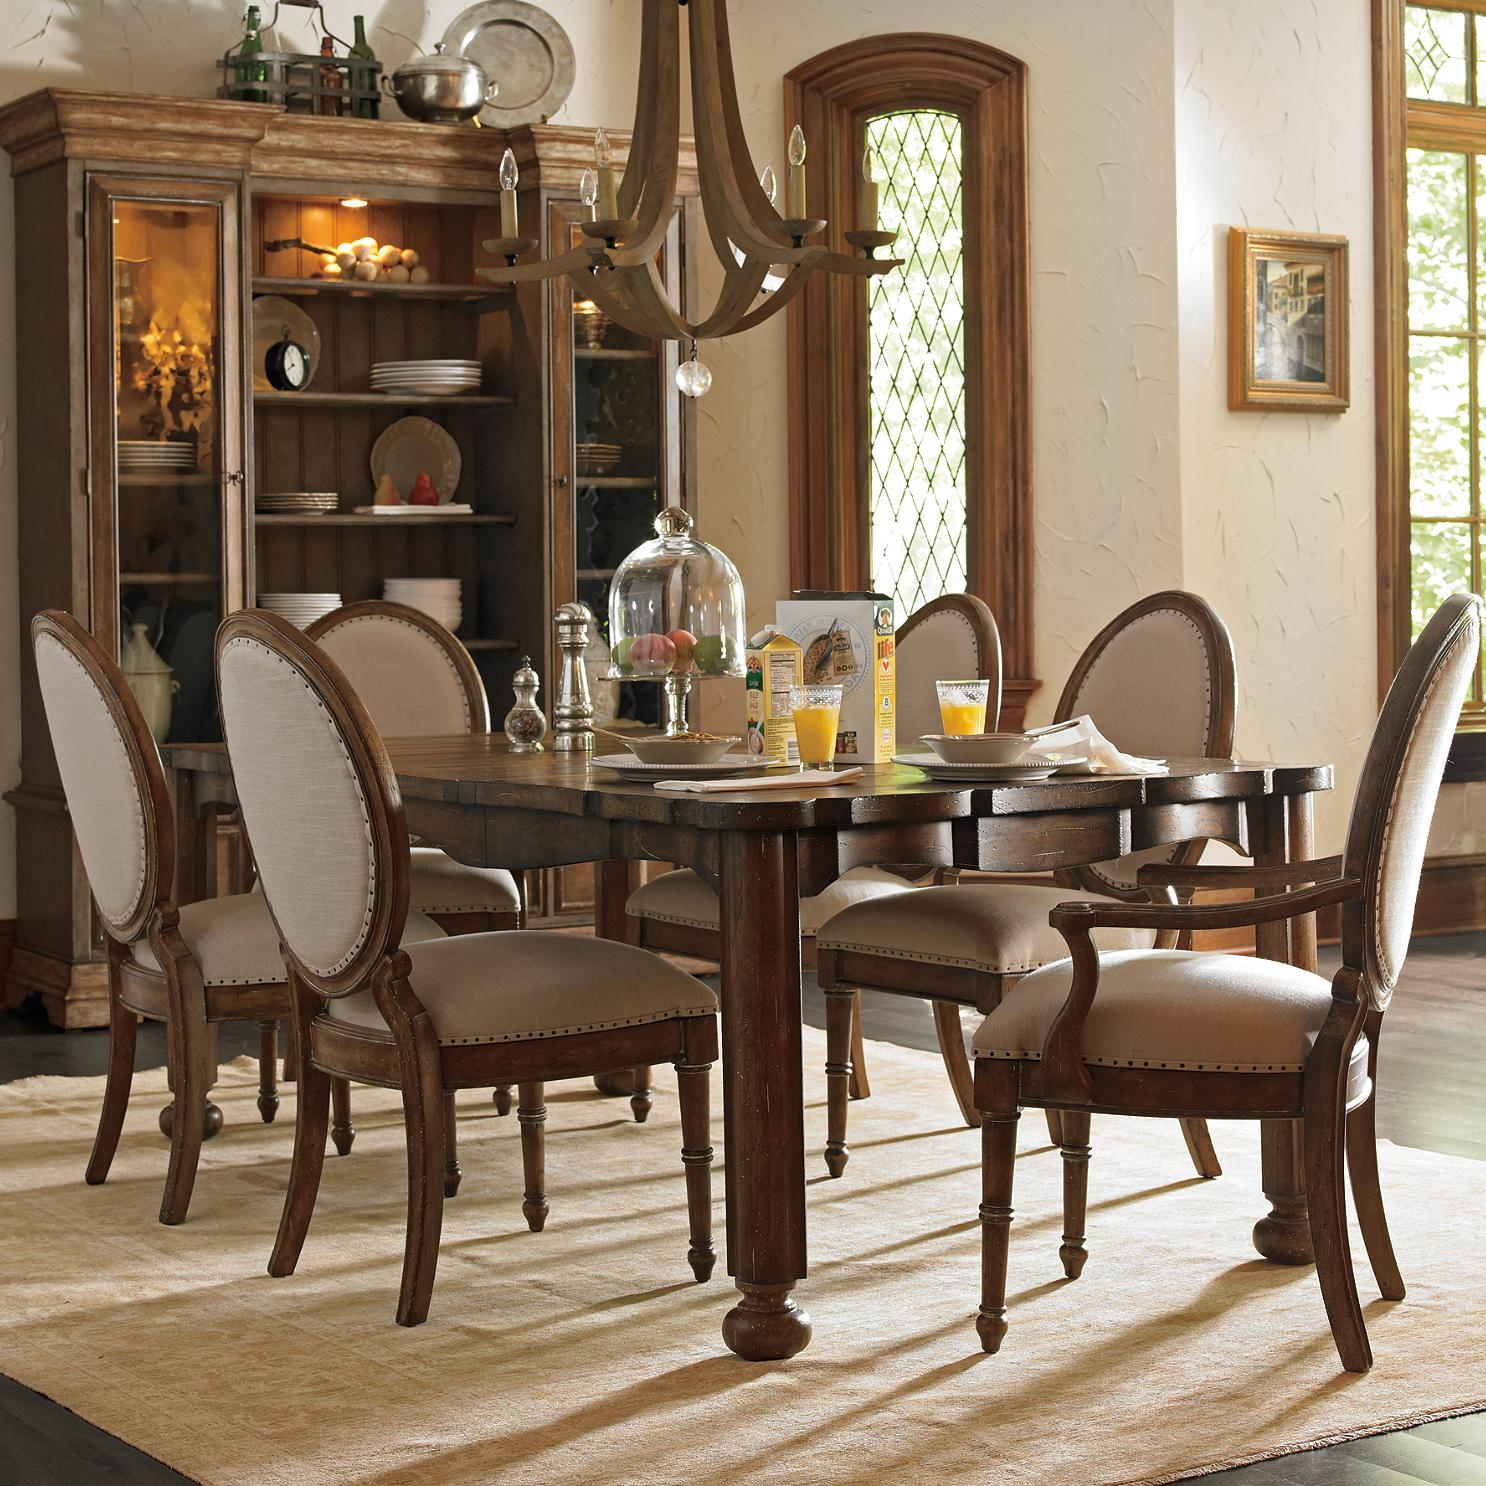 Baer's Furnishing: Create a European Farmhouse Dining Room